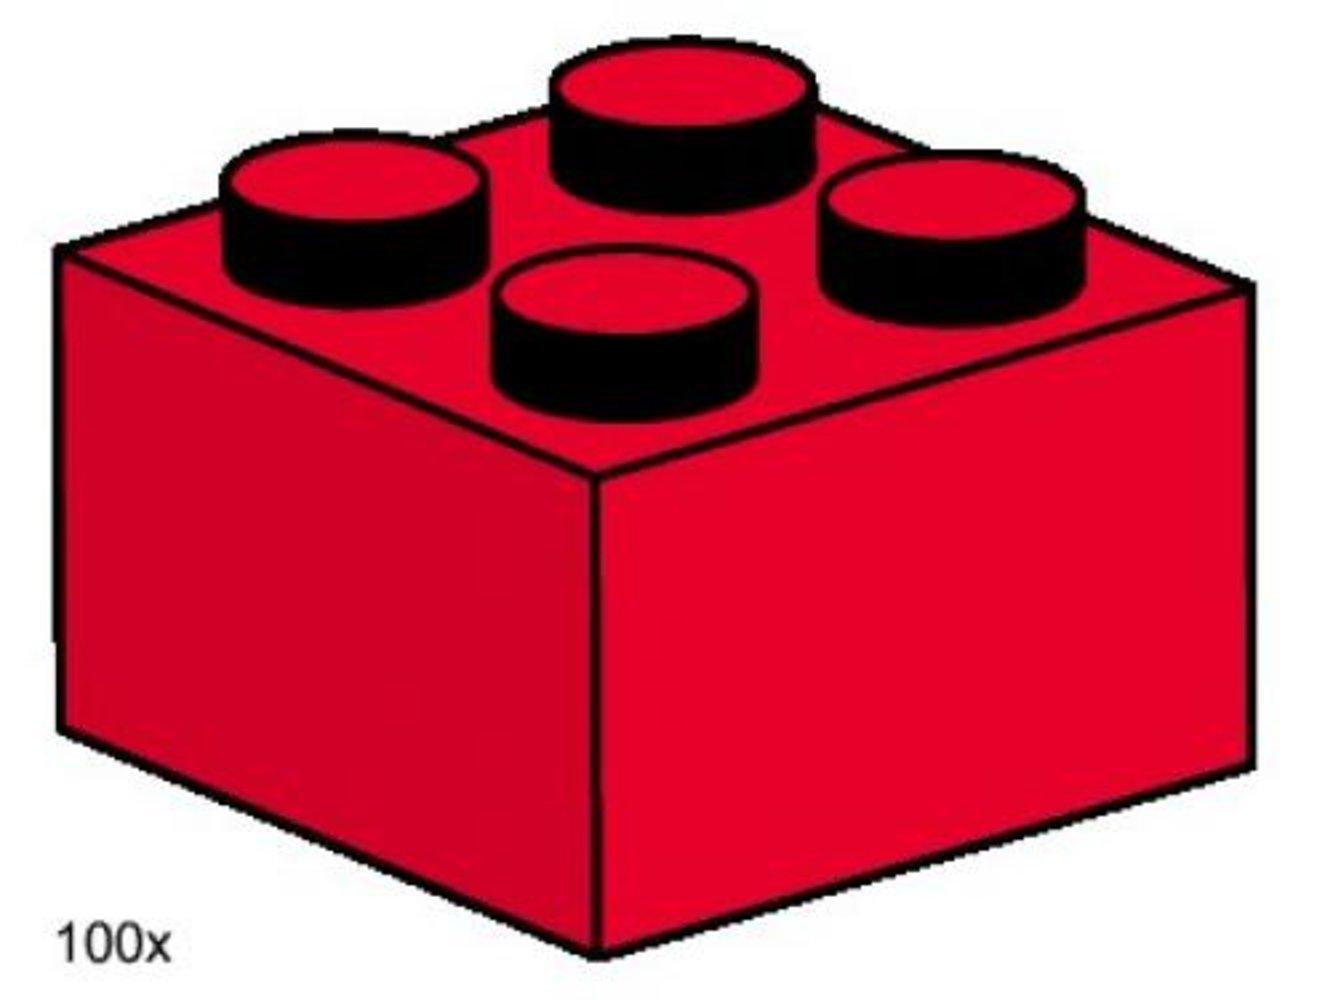 2 x 2 Red Bricks